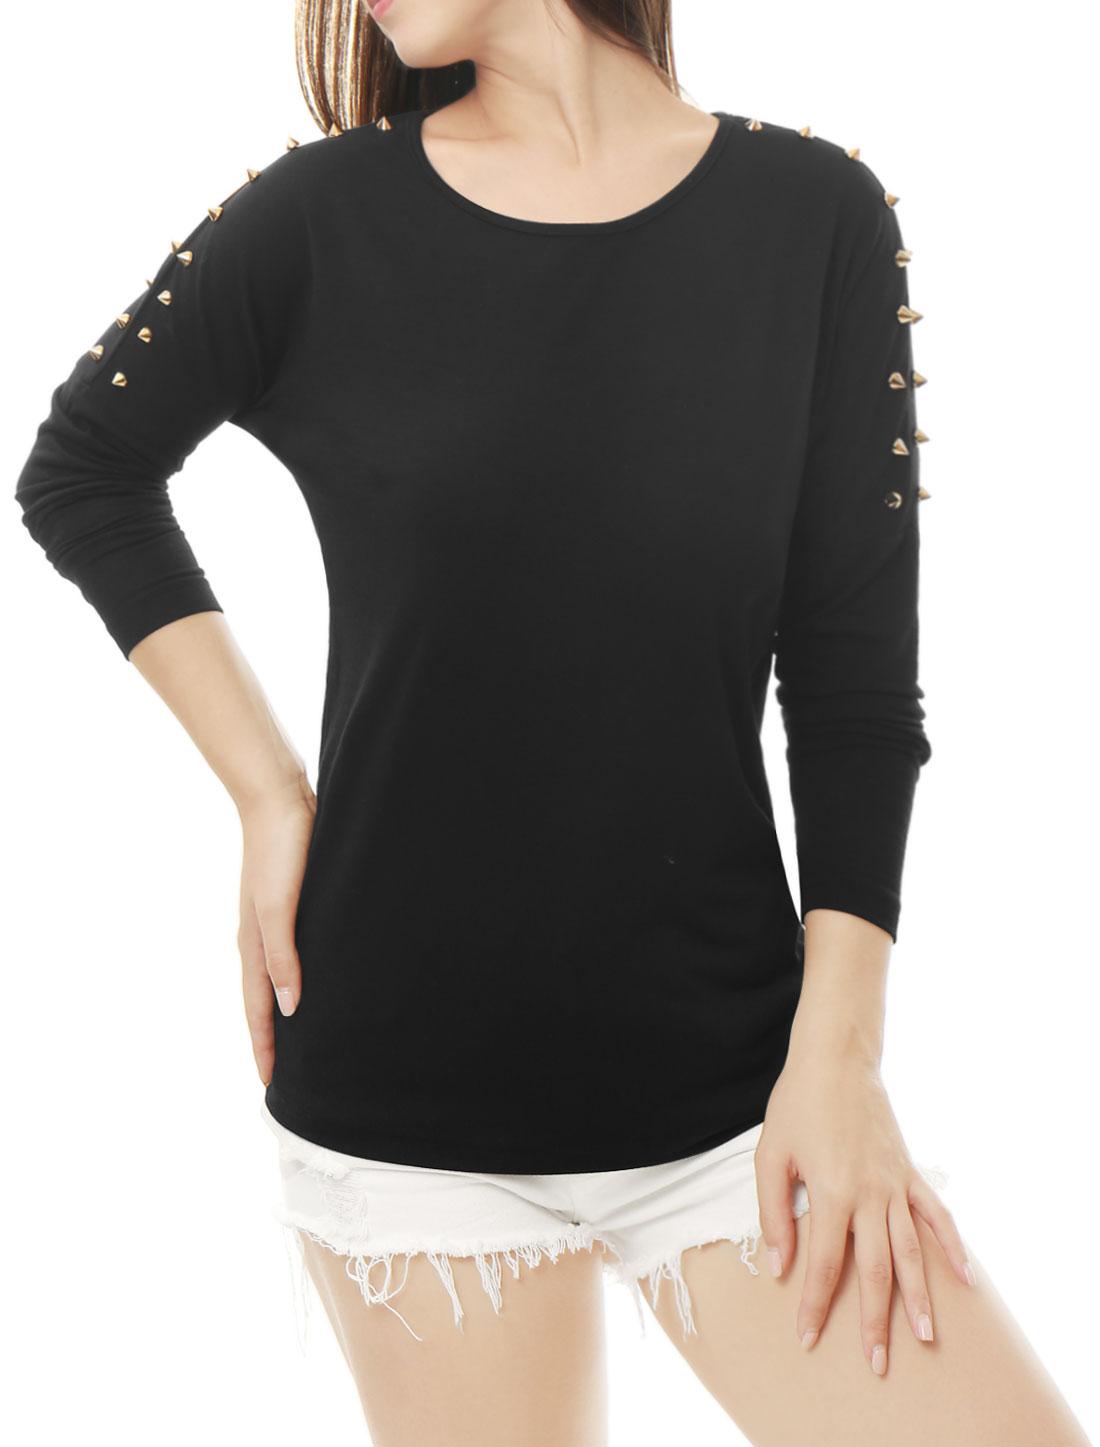 Women Round Neck Studs Embellished Dolman Sleeves Top Black XS